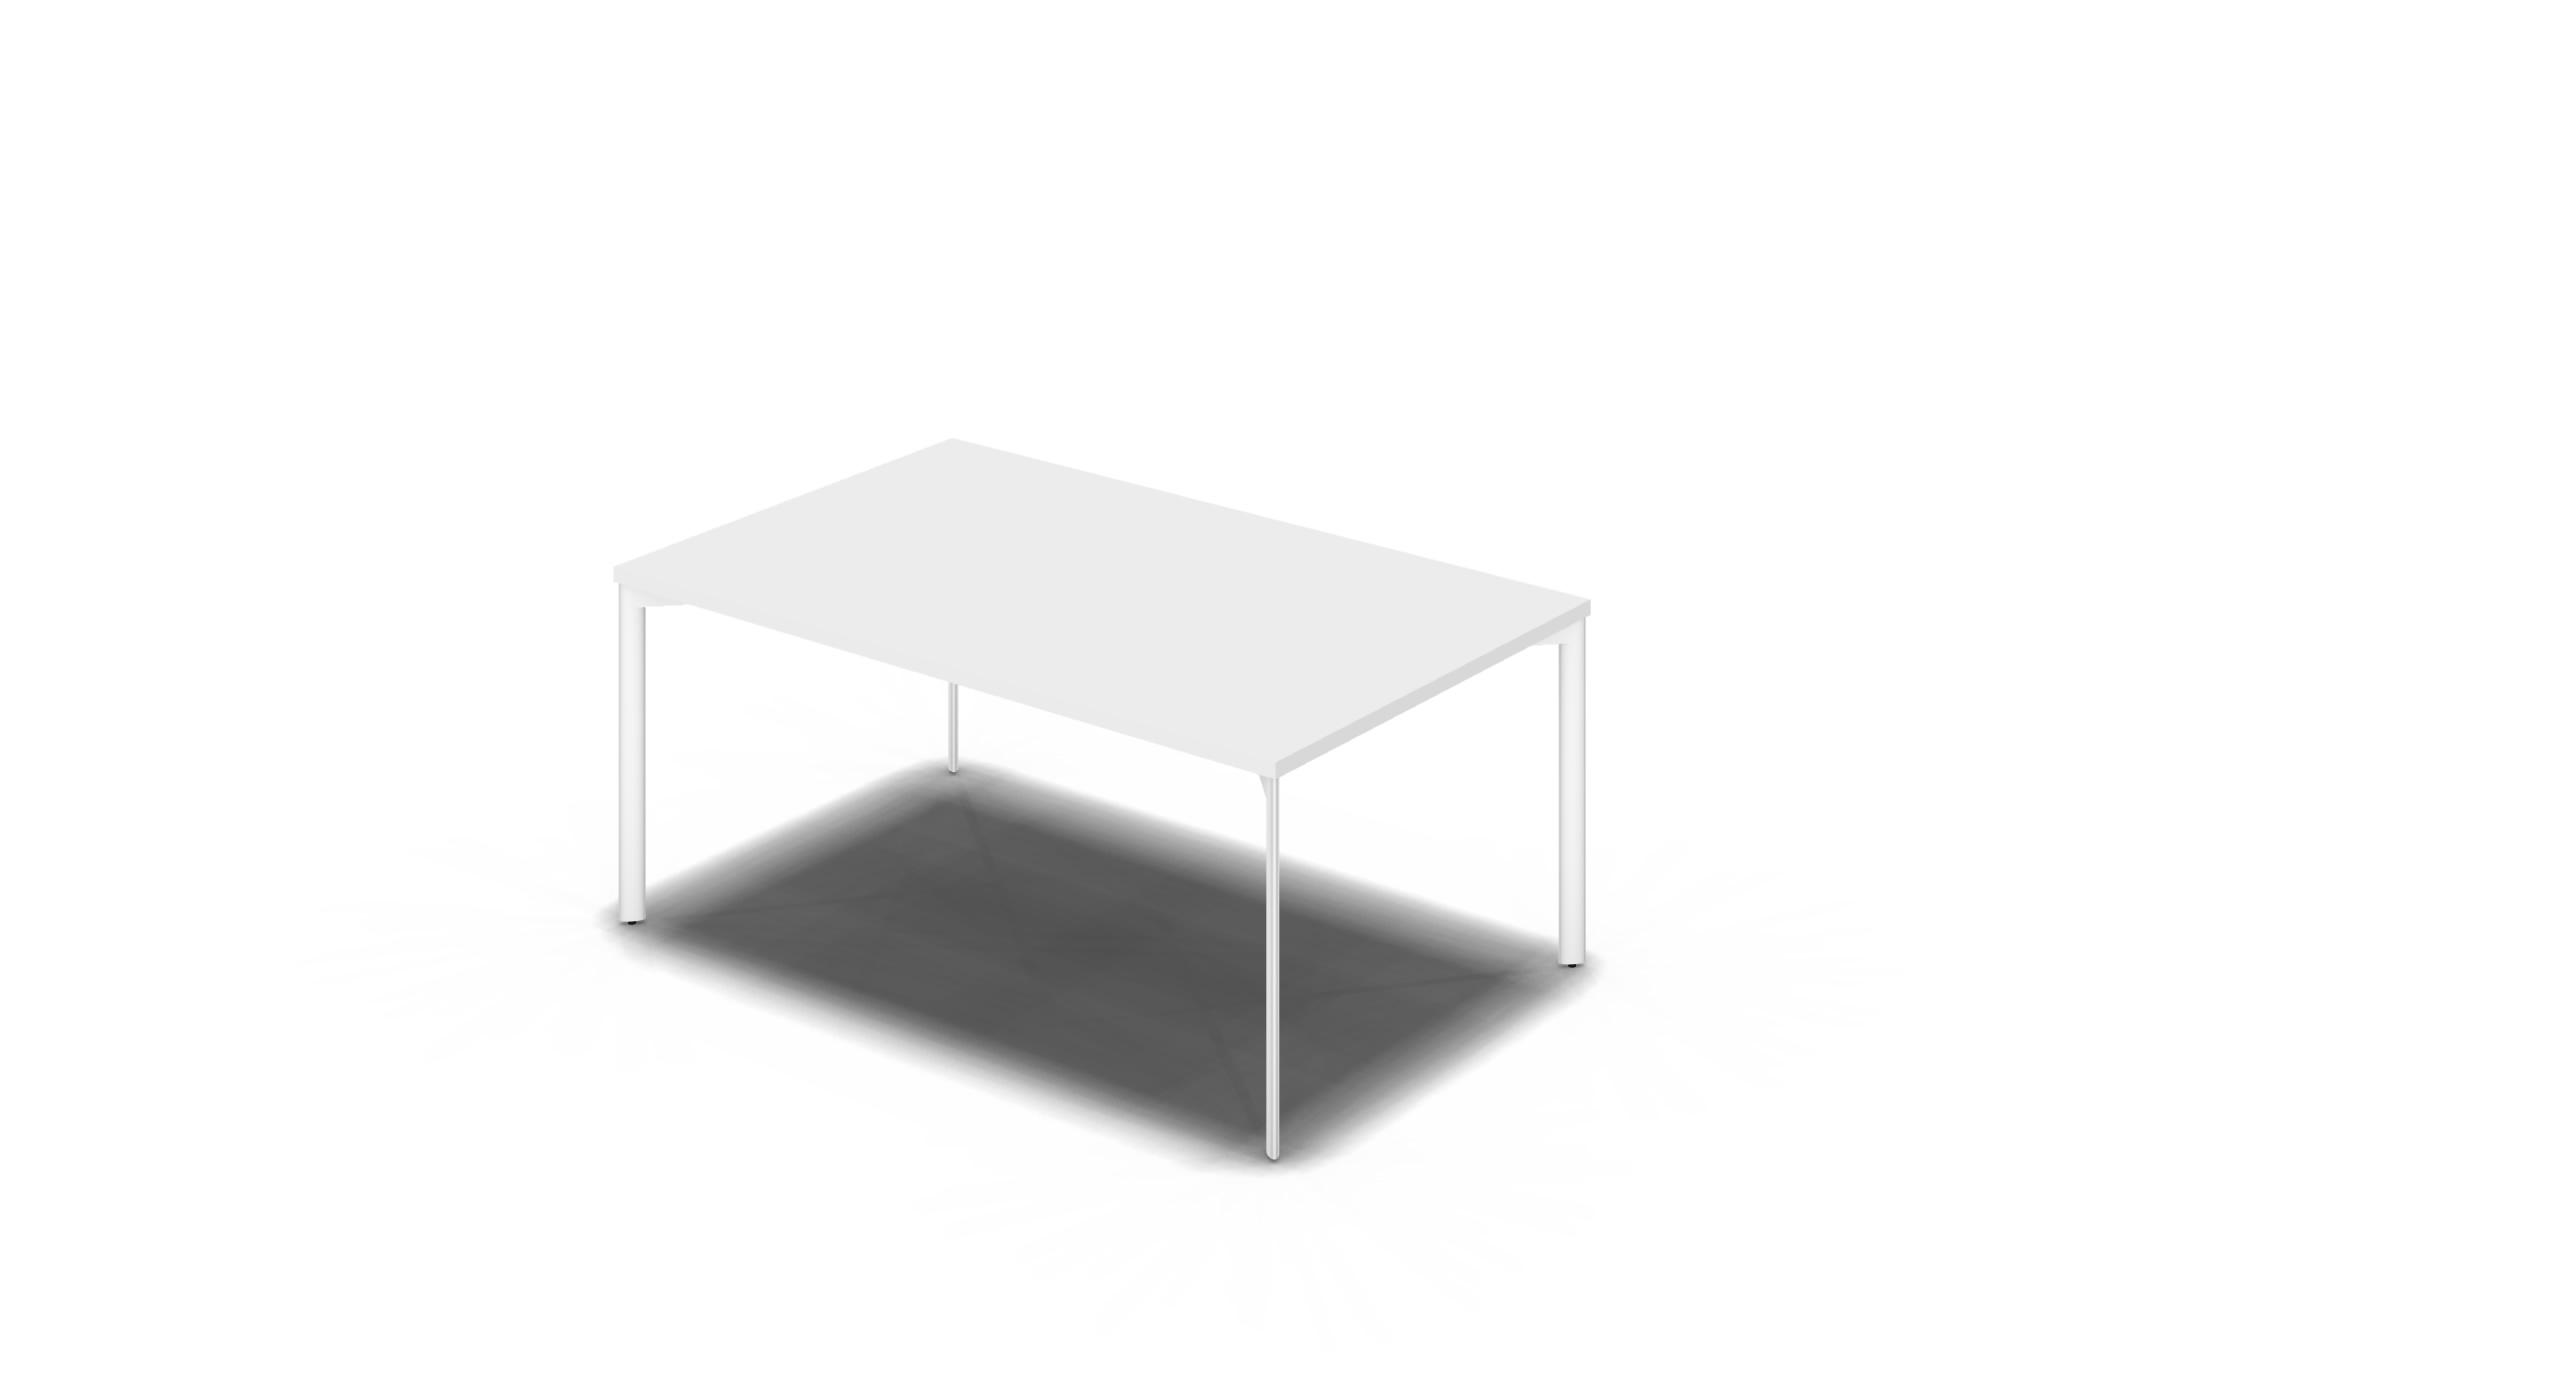 Table_Slim_1500x900_White_White_noOption